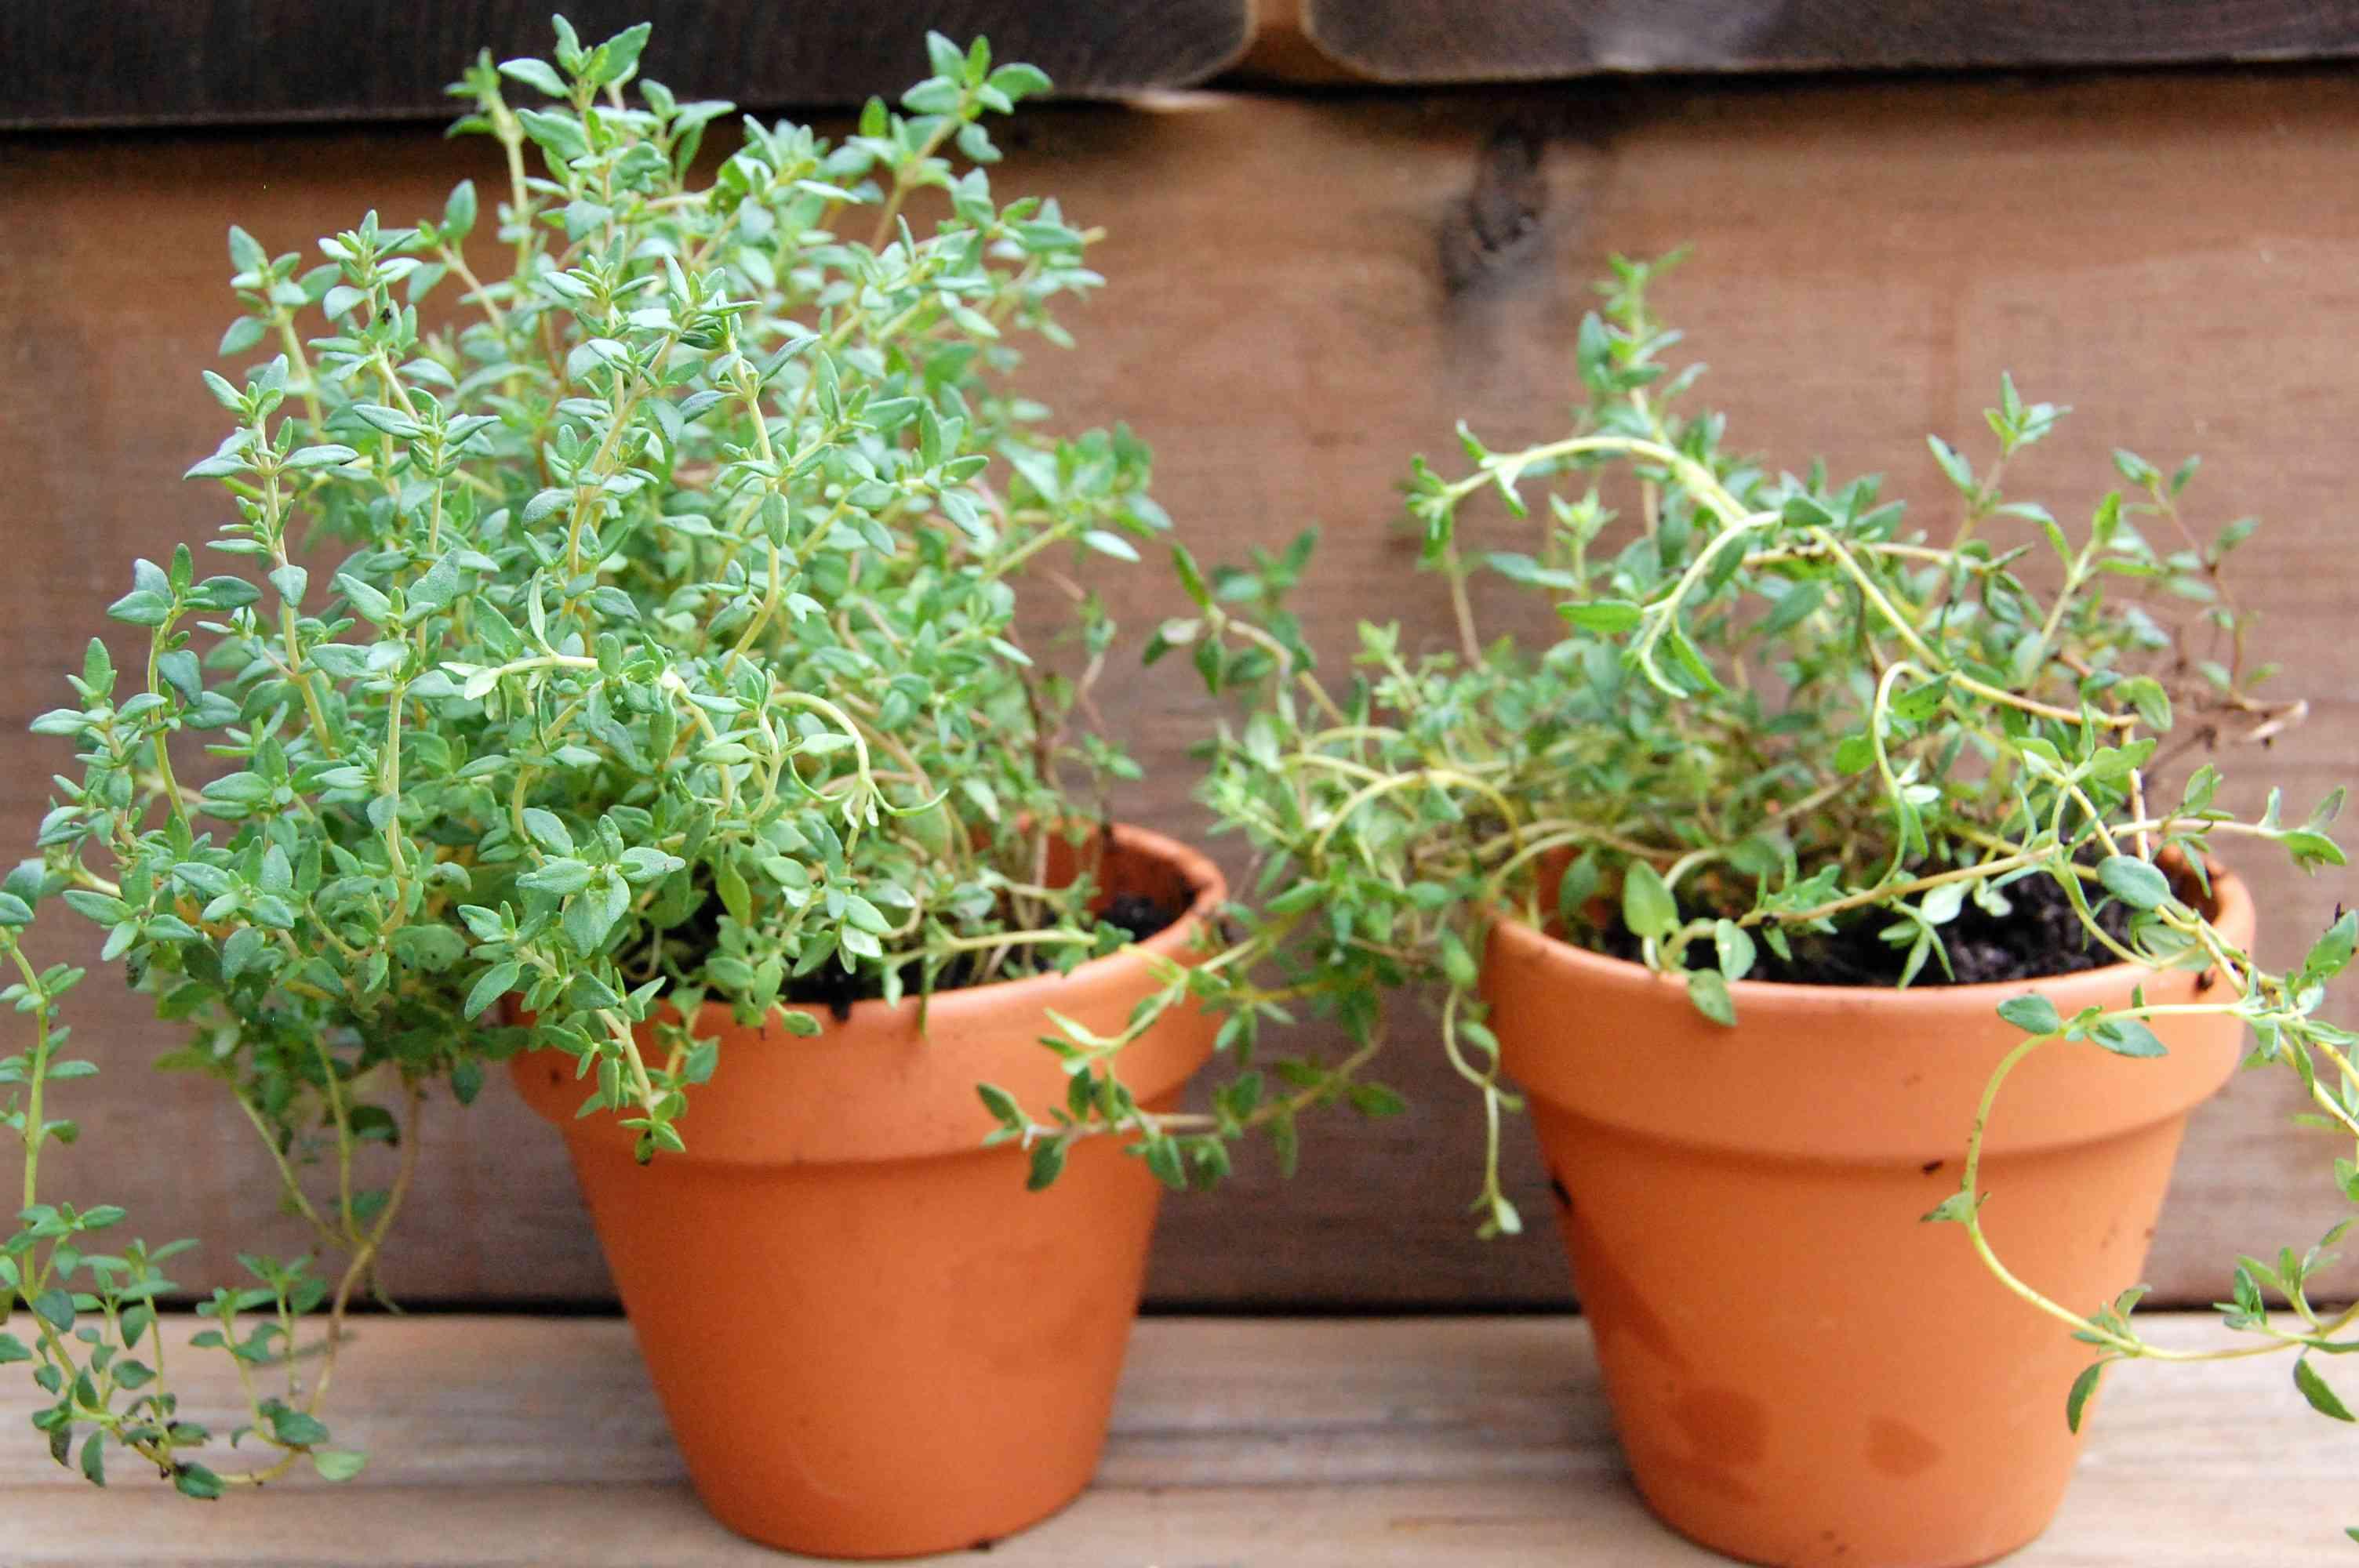 leggy, woody herbs